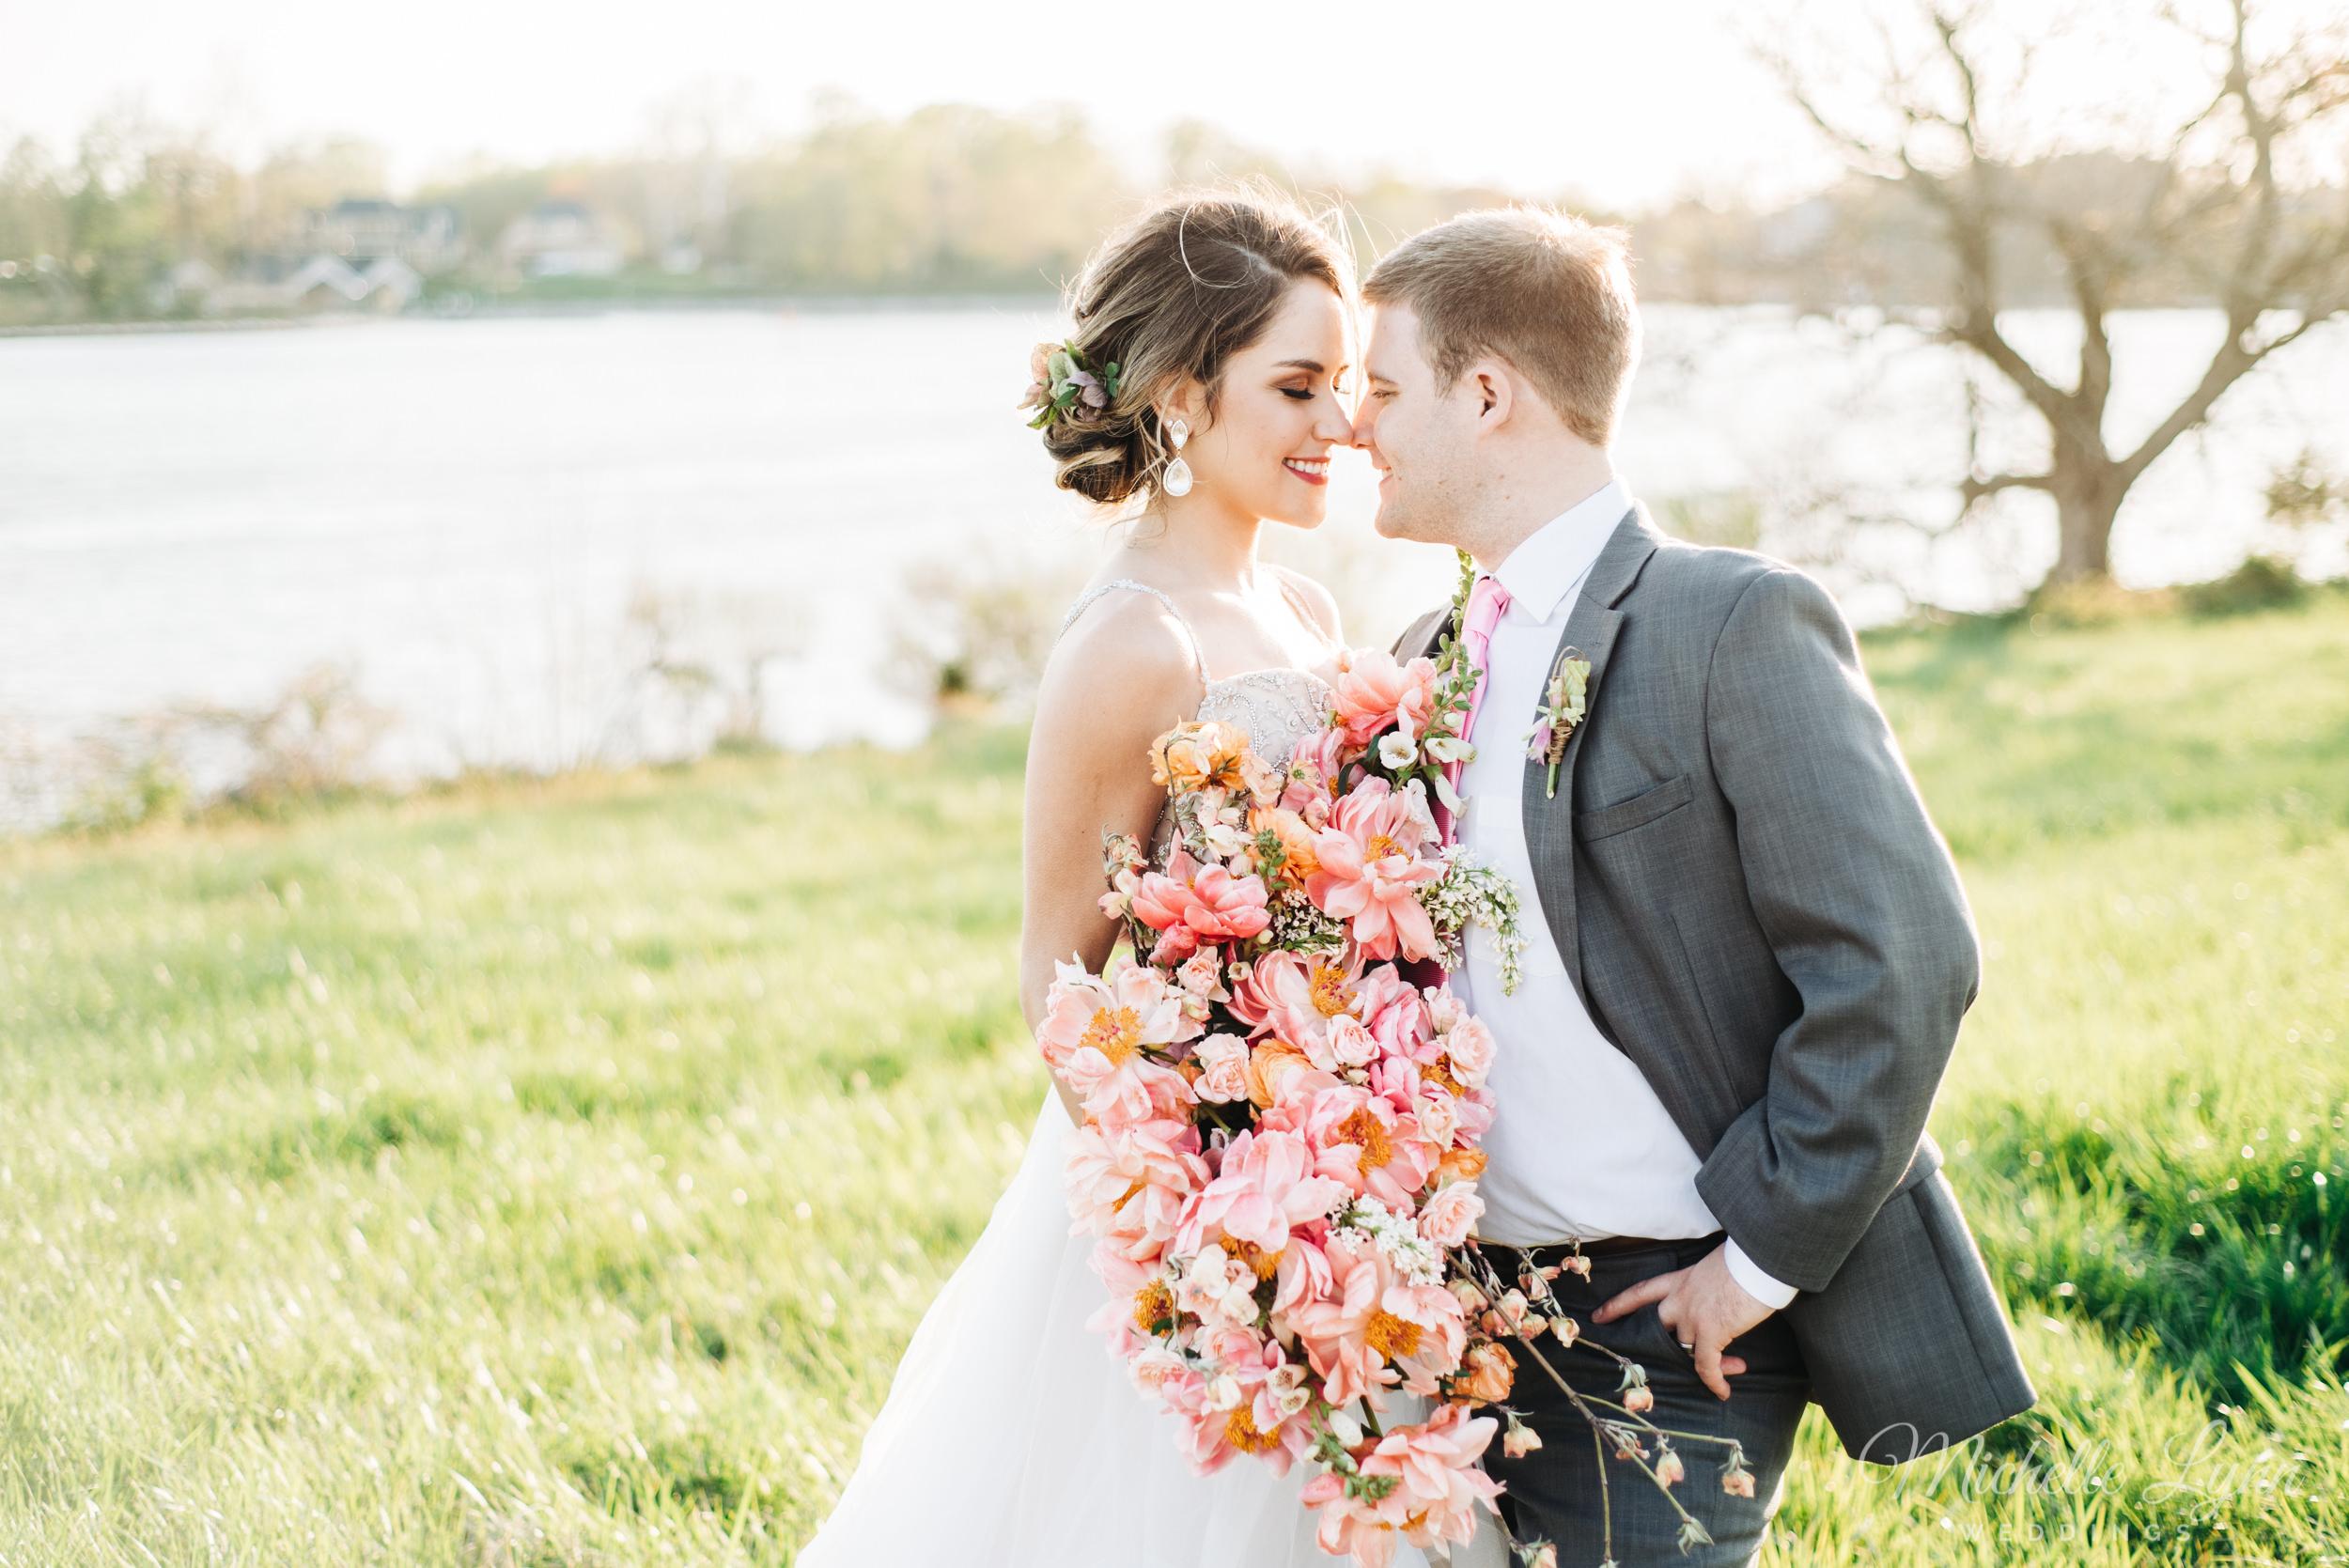 mlw-whitehall-annapolis-maryland-wedding-38.jpg